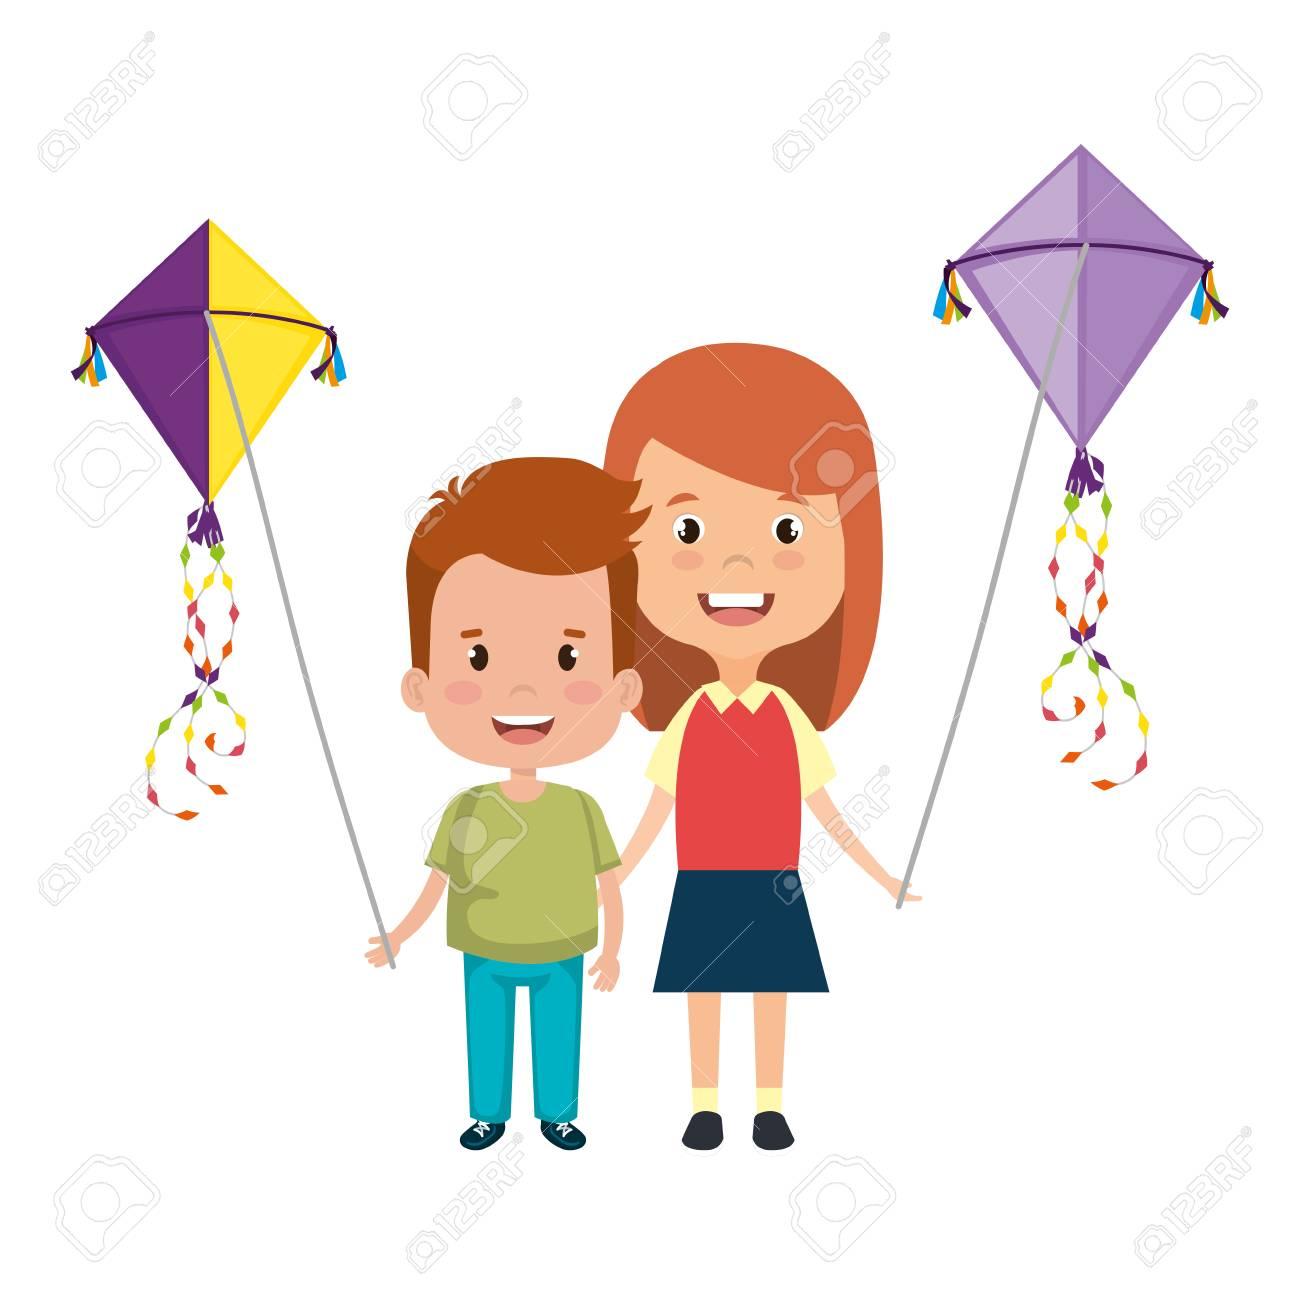 kids couple with kite flying vector illustration design - 127642339